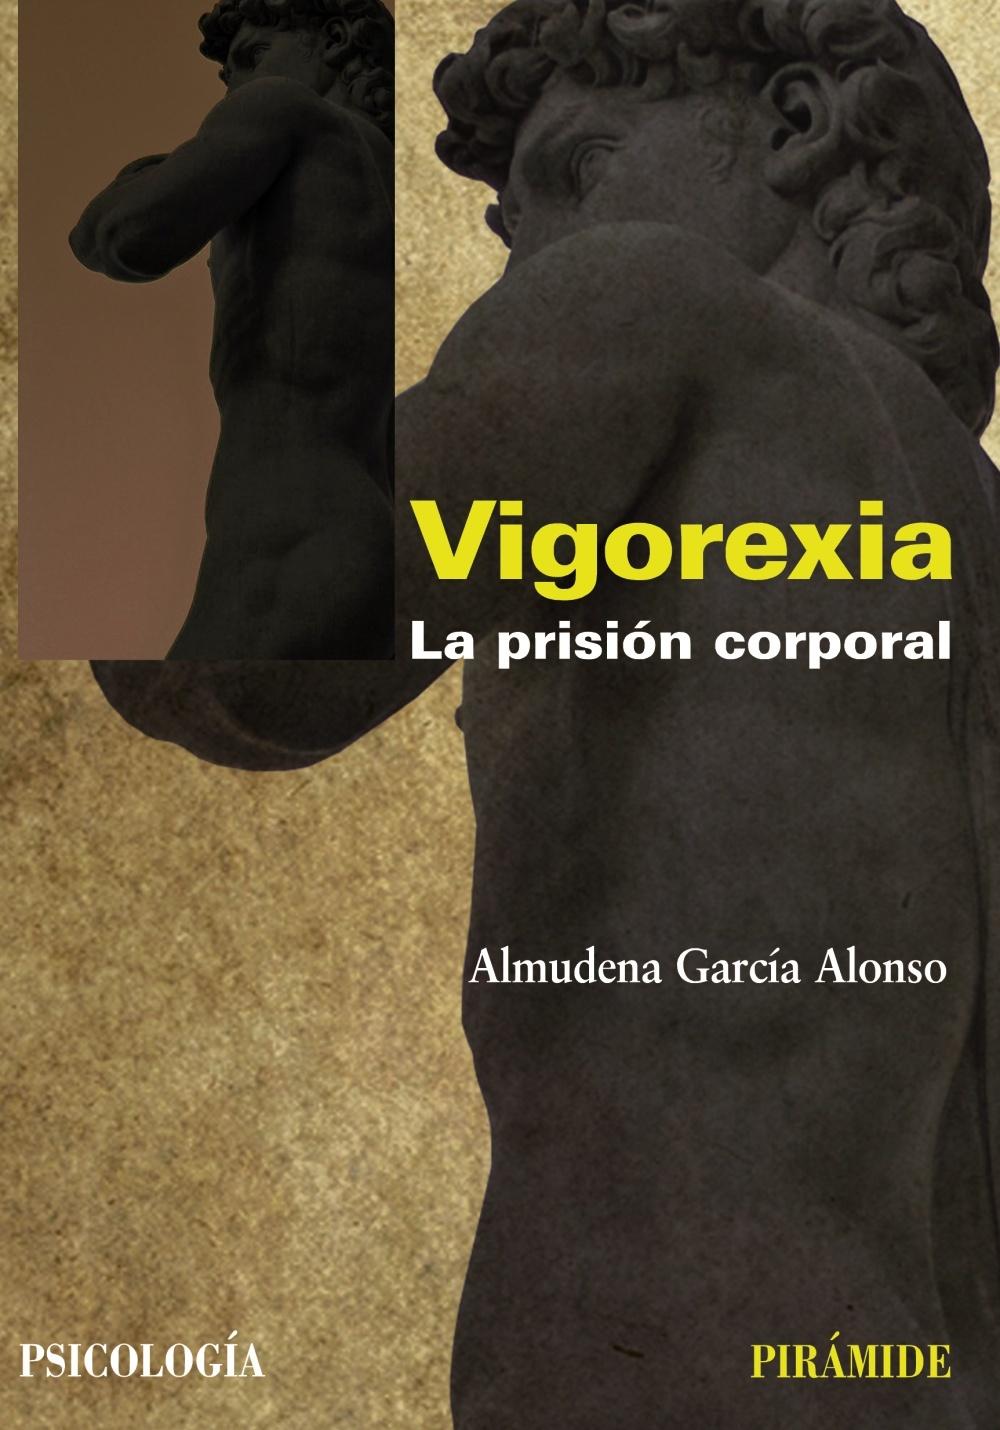 VIGOREXIA: LA PRISIÓN CORPORAL